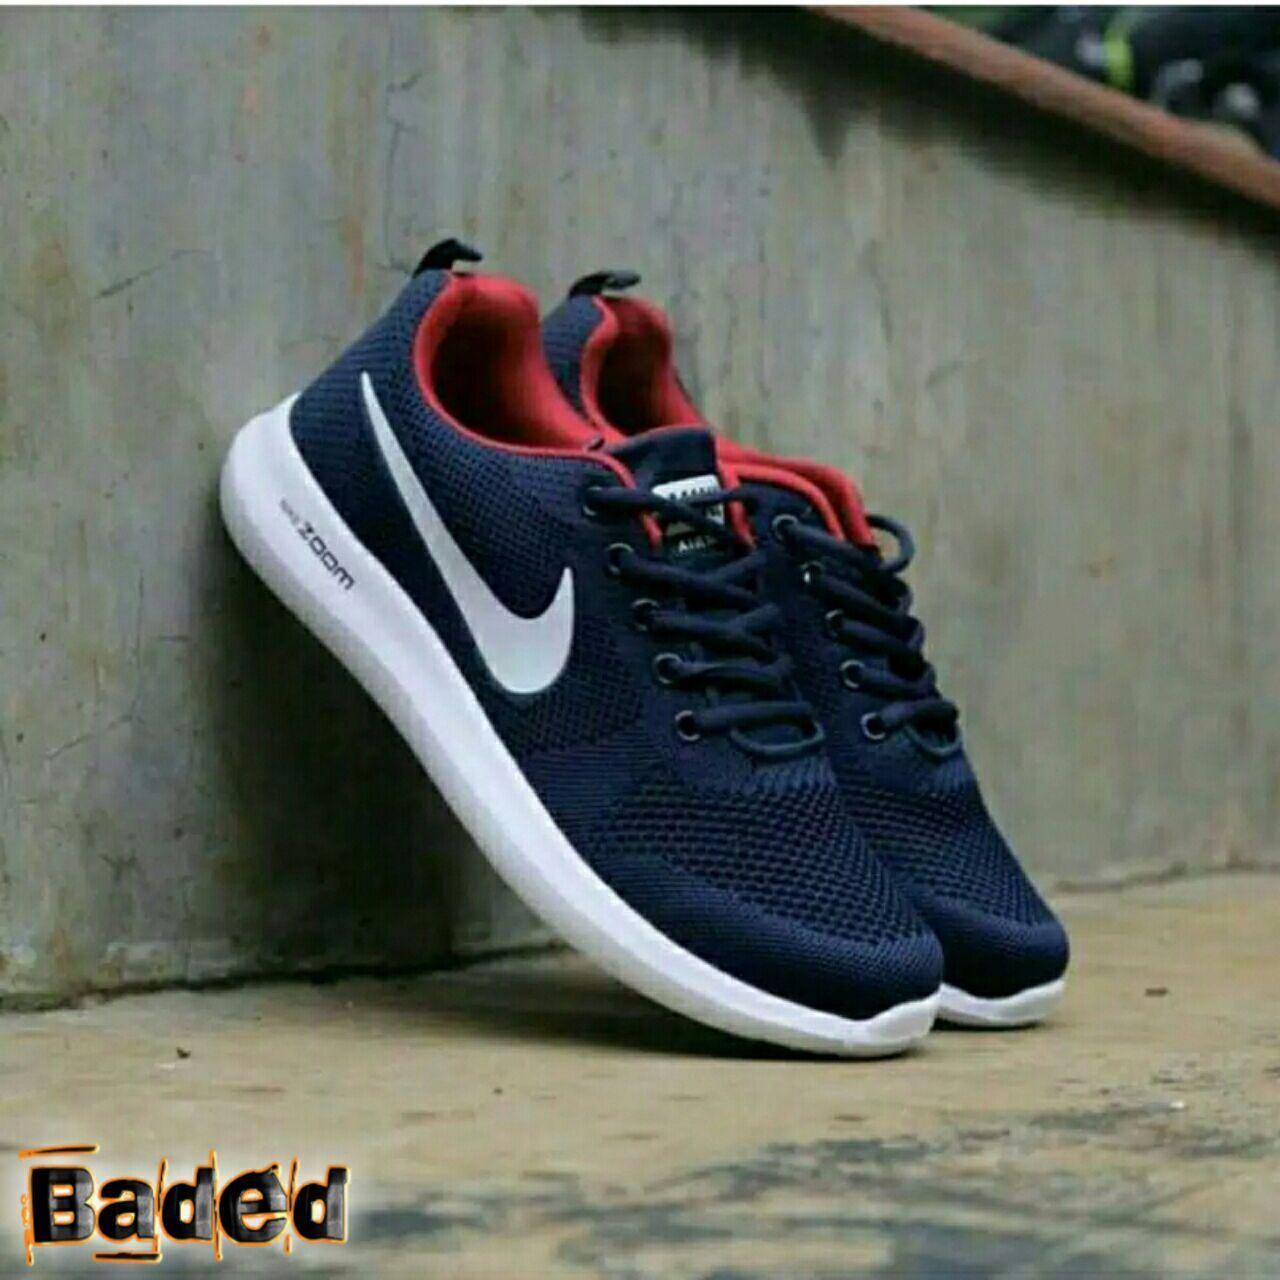 Baded - Sepatu Keren Nikè Zoom Pria Import Vietnam - Sepatu Sneakers Sport  - Nevy d825e93dd3